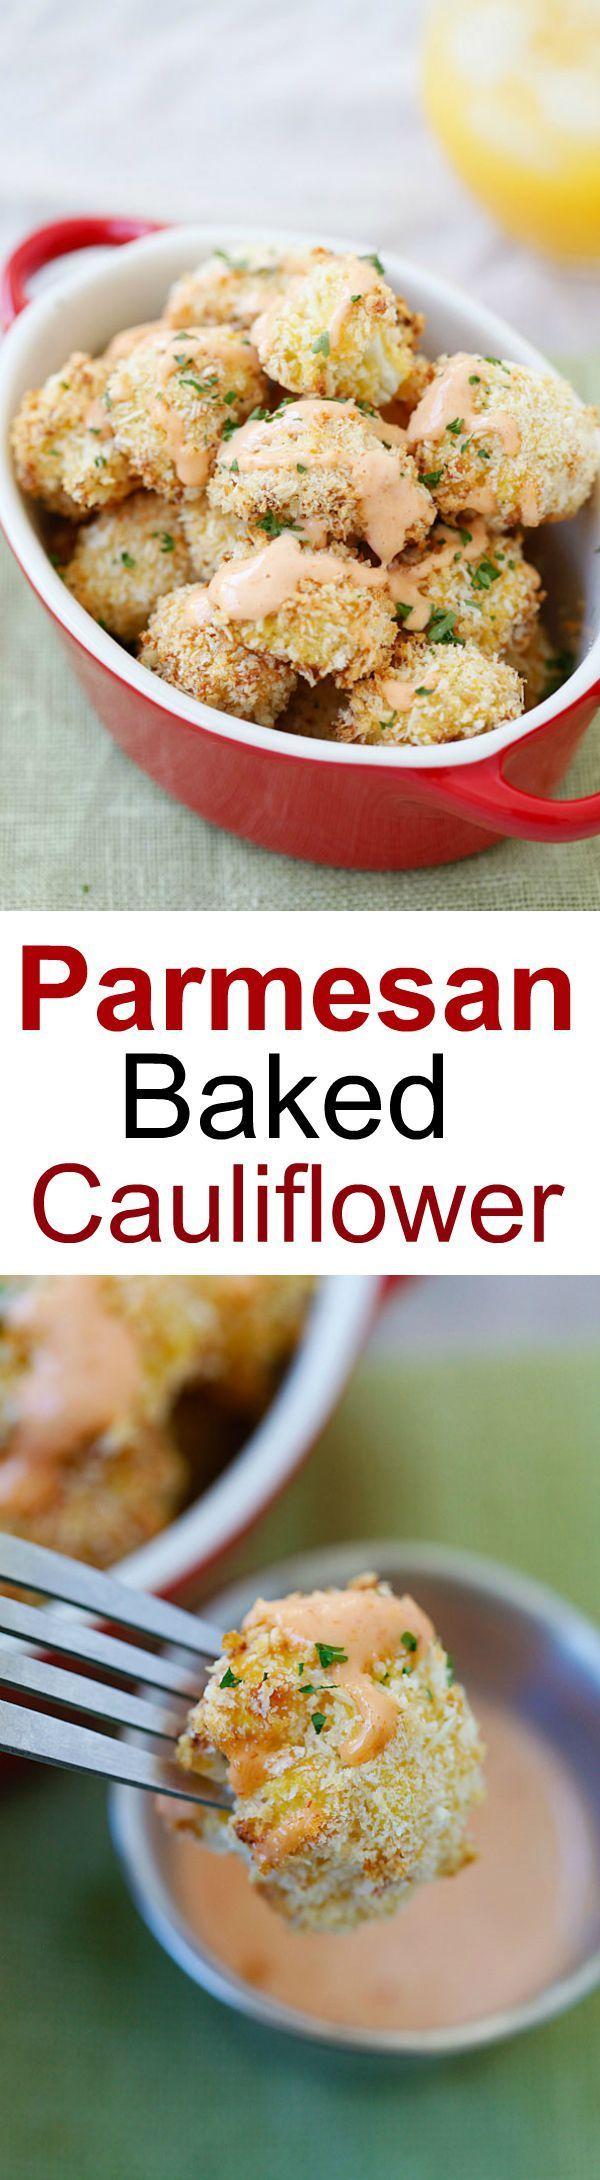 Parmesan Baked Cauliflower – crispy, healthy cauliflower coated with ...